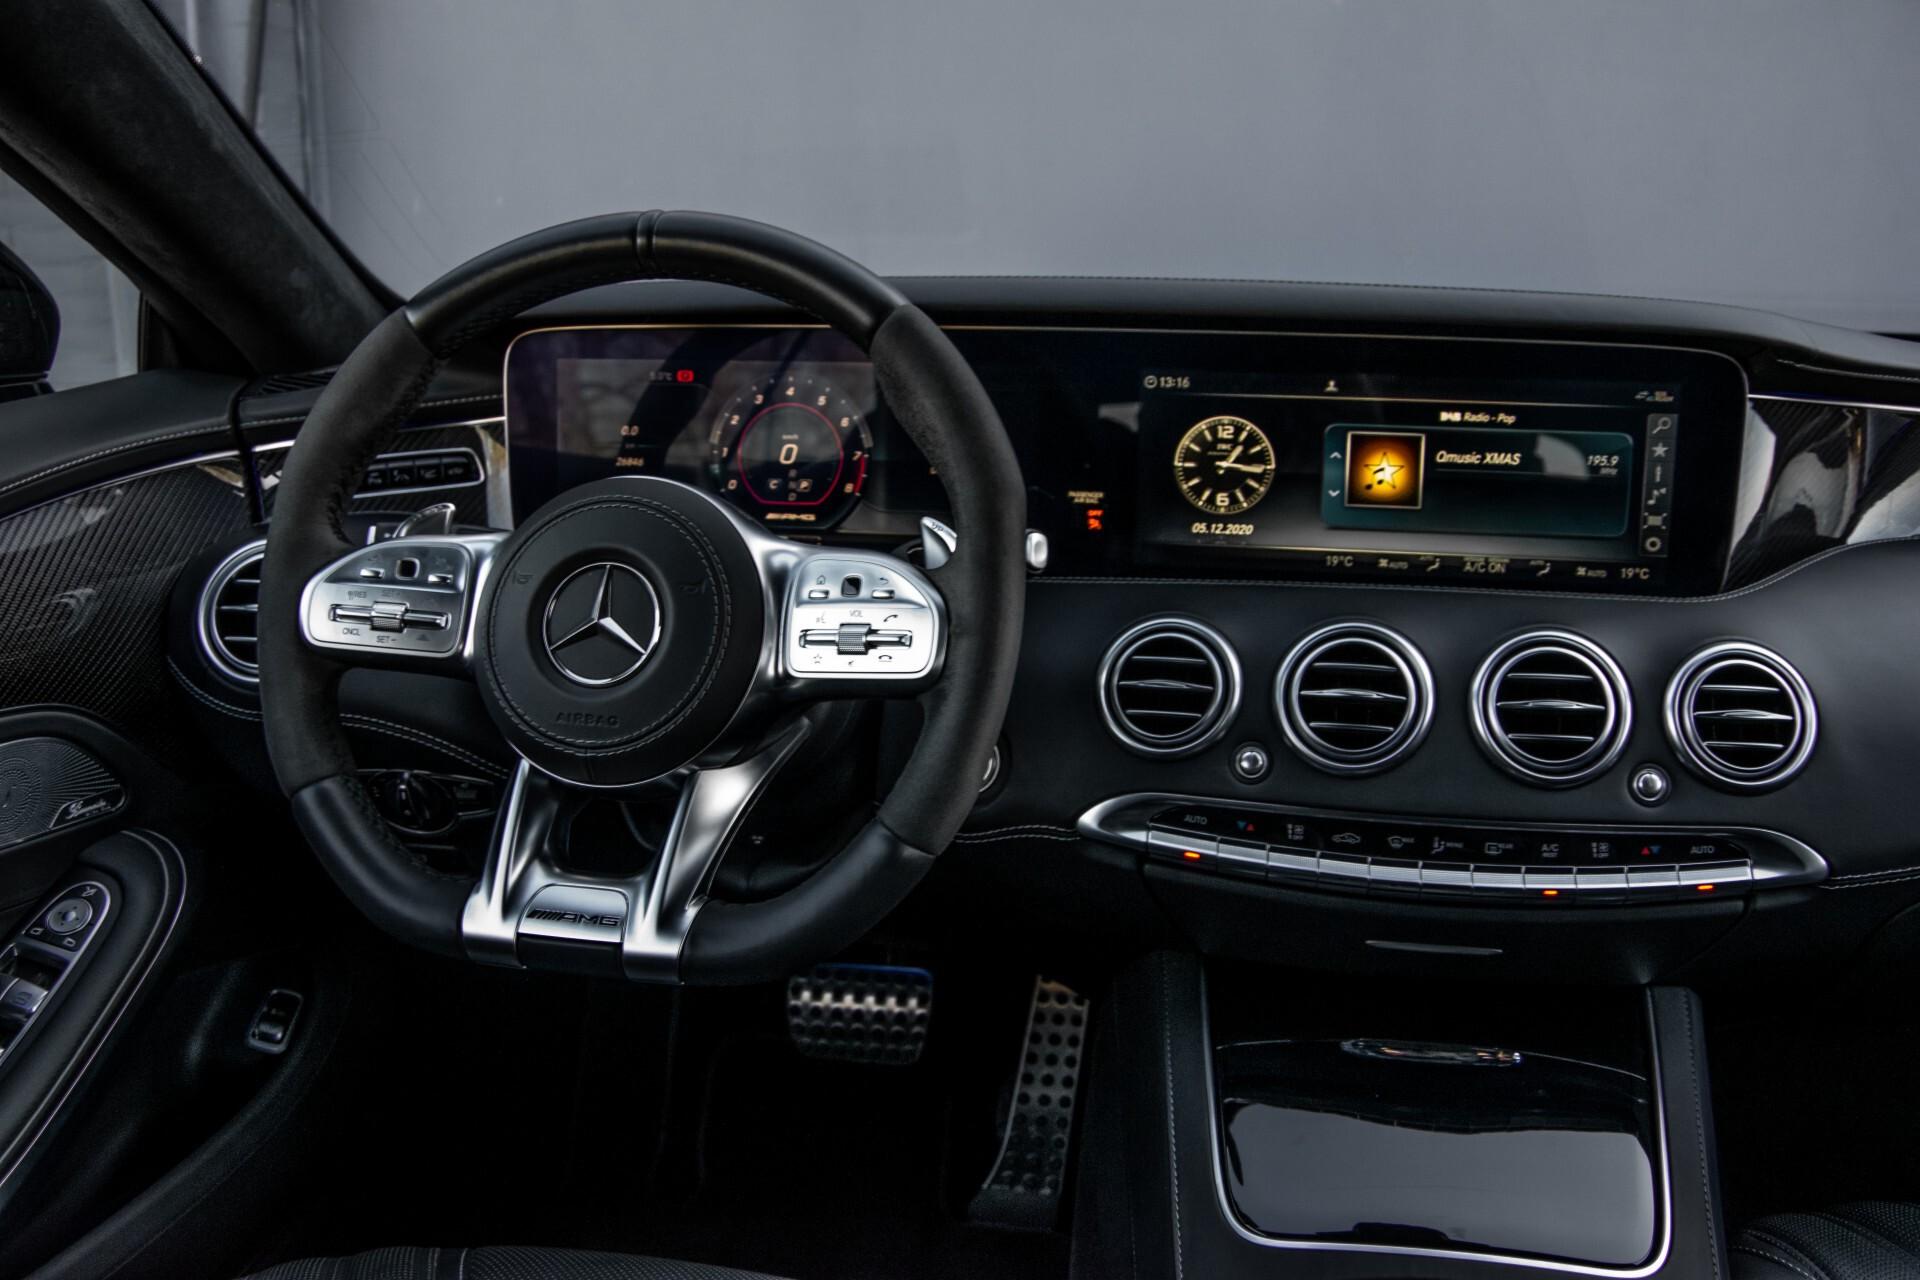 Mercedes-Benz S-Klasse Cabrio 63 AMG 4M+ Keramisch/Burmester High End 3D/Carbon/Driverspack/Blackpack Aut9 Foto 8